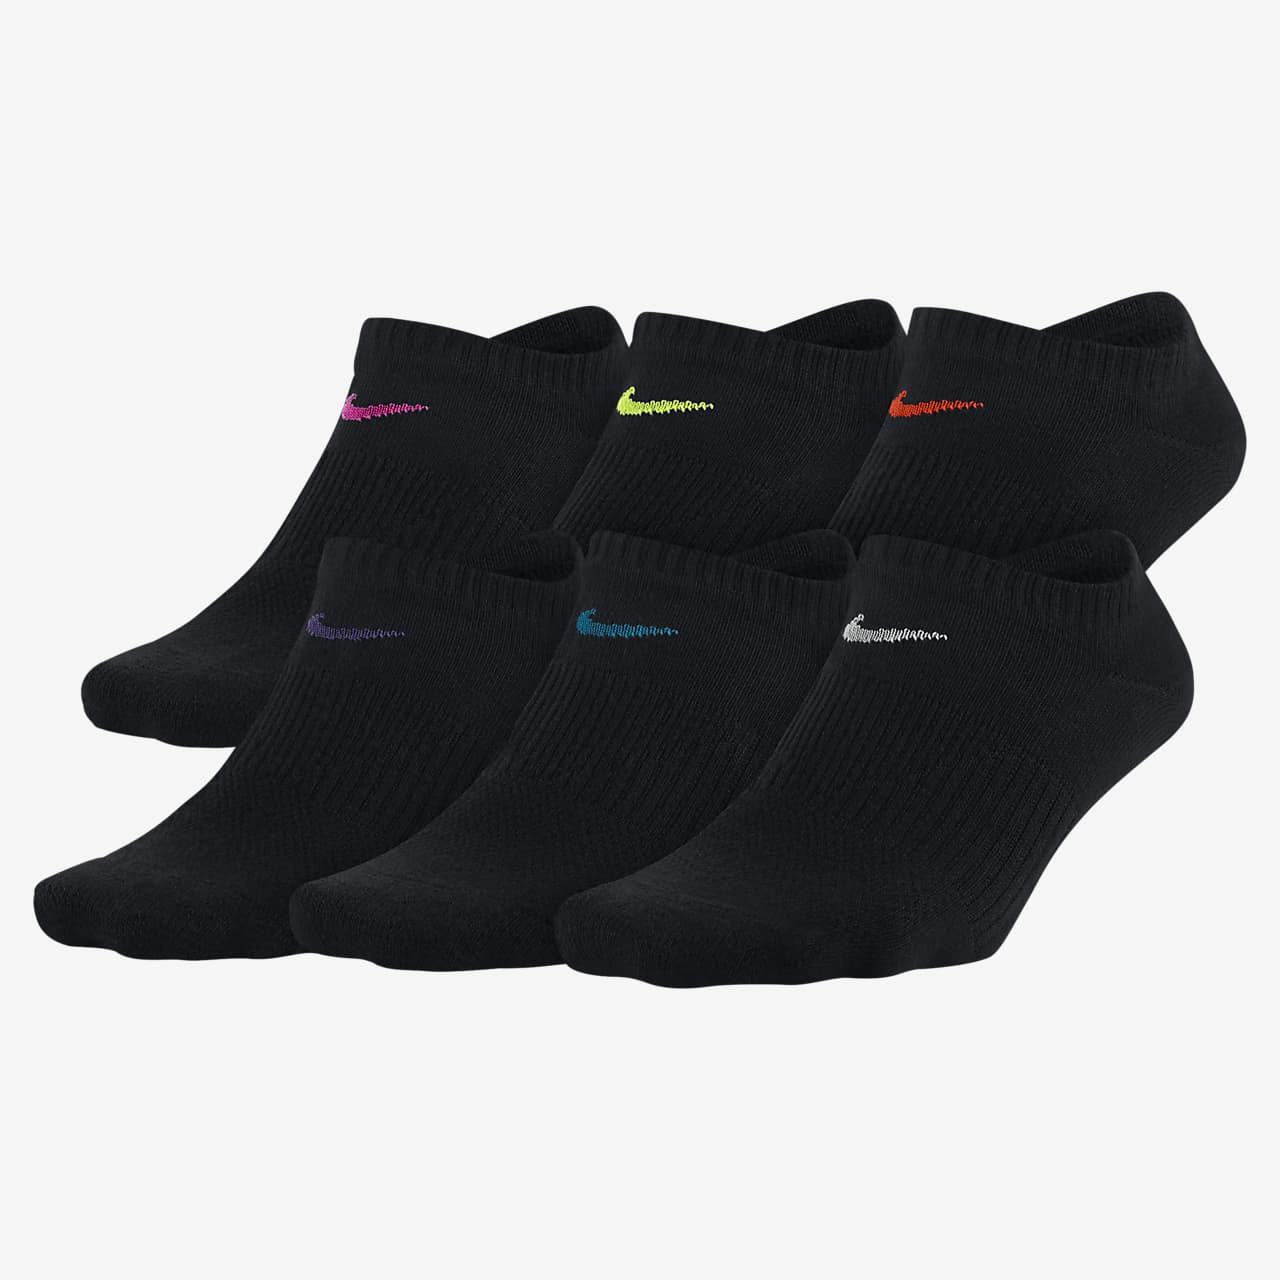 Calcetines de entrenamiento invisibles Nike Everyday Lightweight (6 pares)